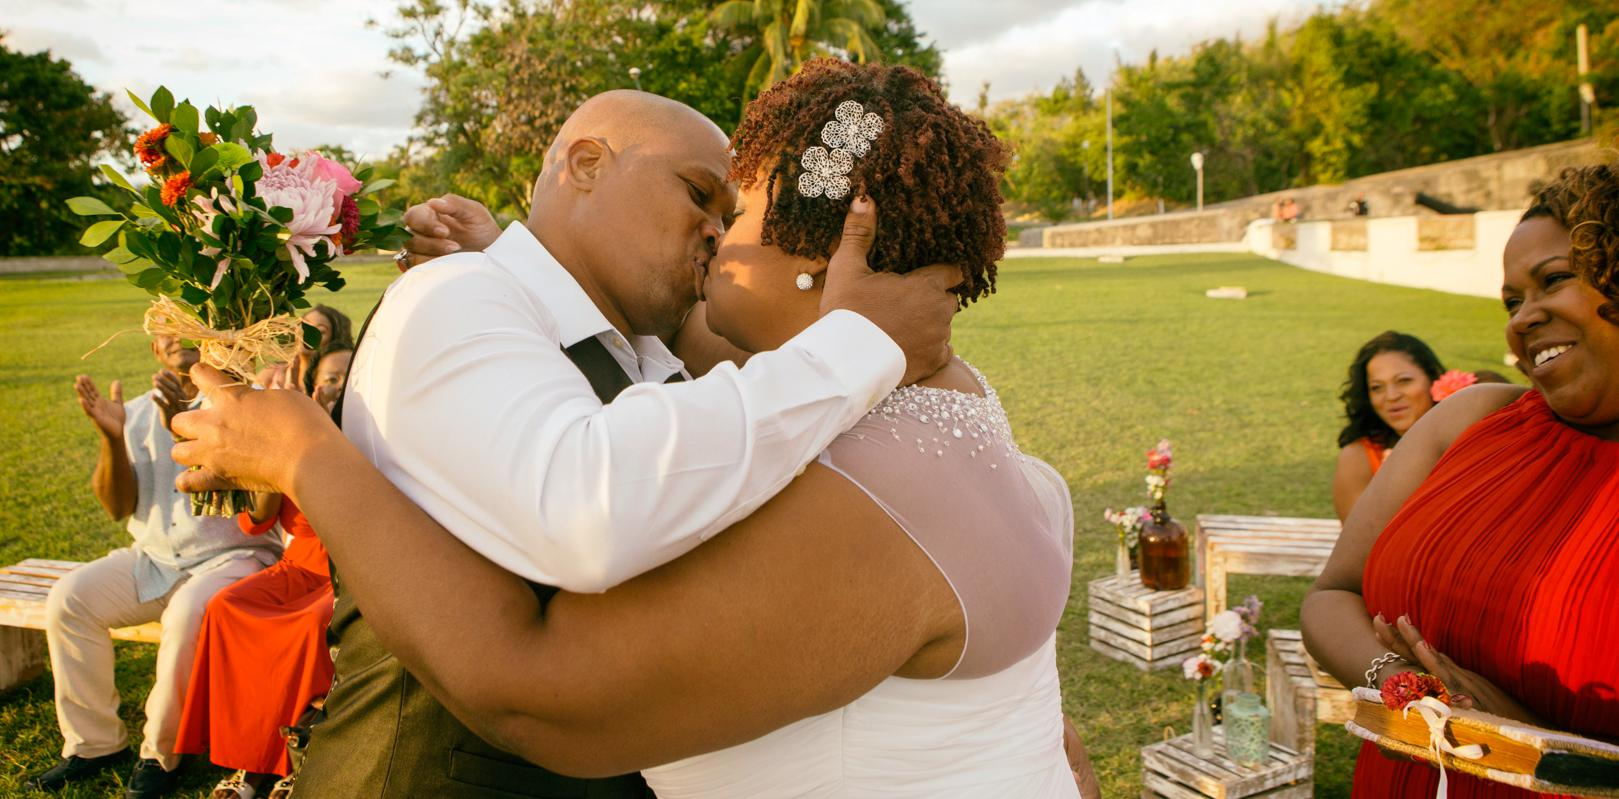 bodas-sin-clasificar-sin-tema-cuba-42123.jpg